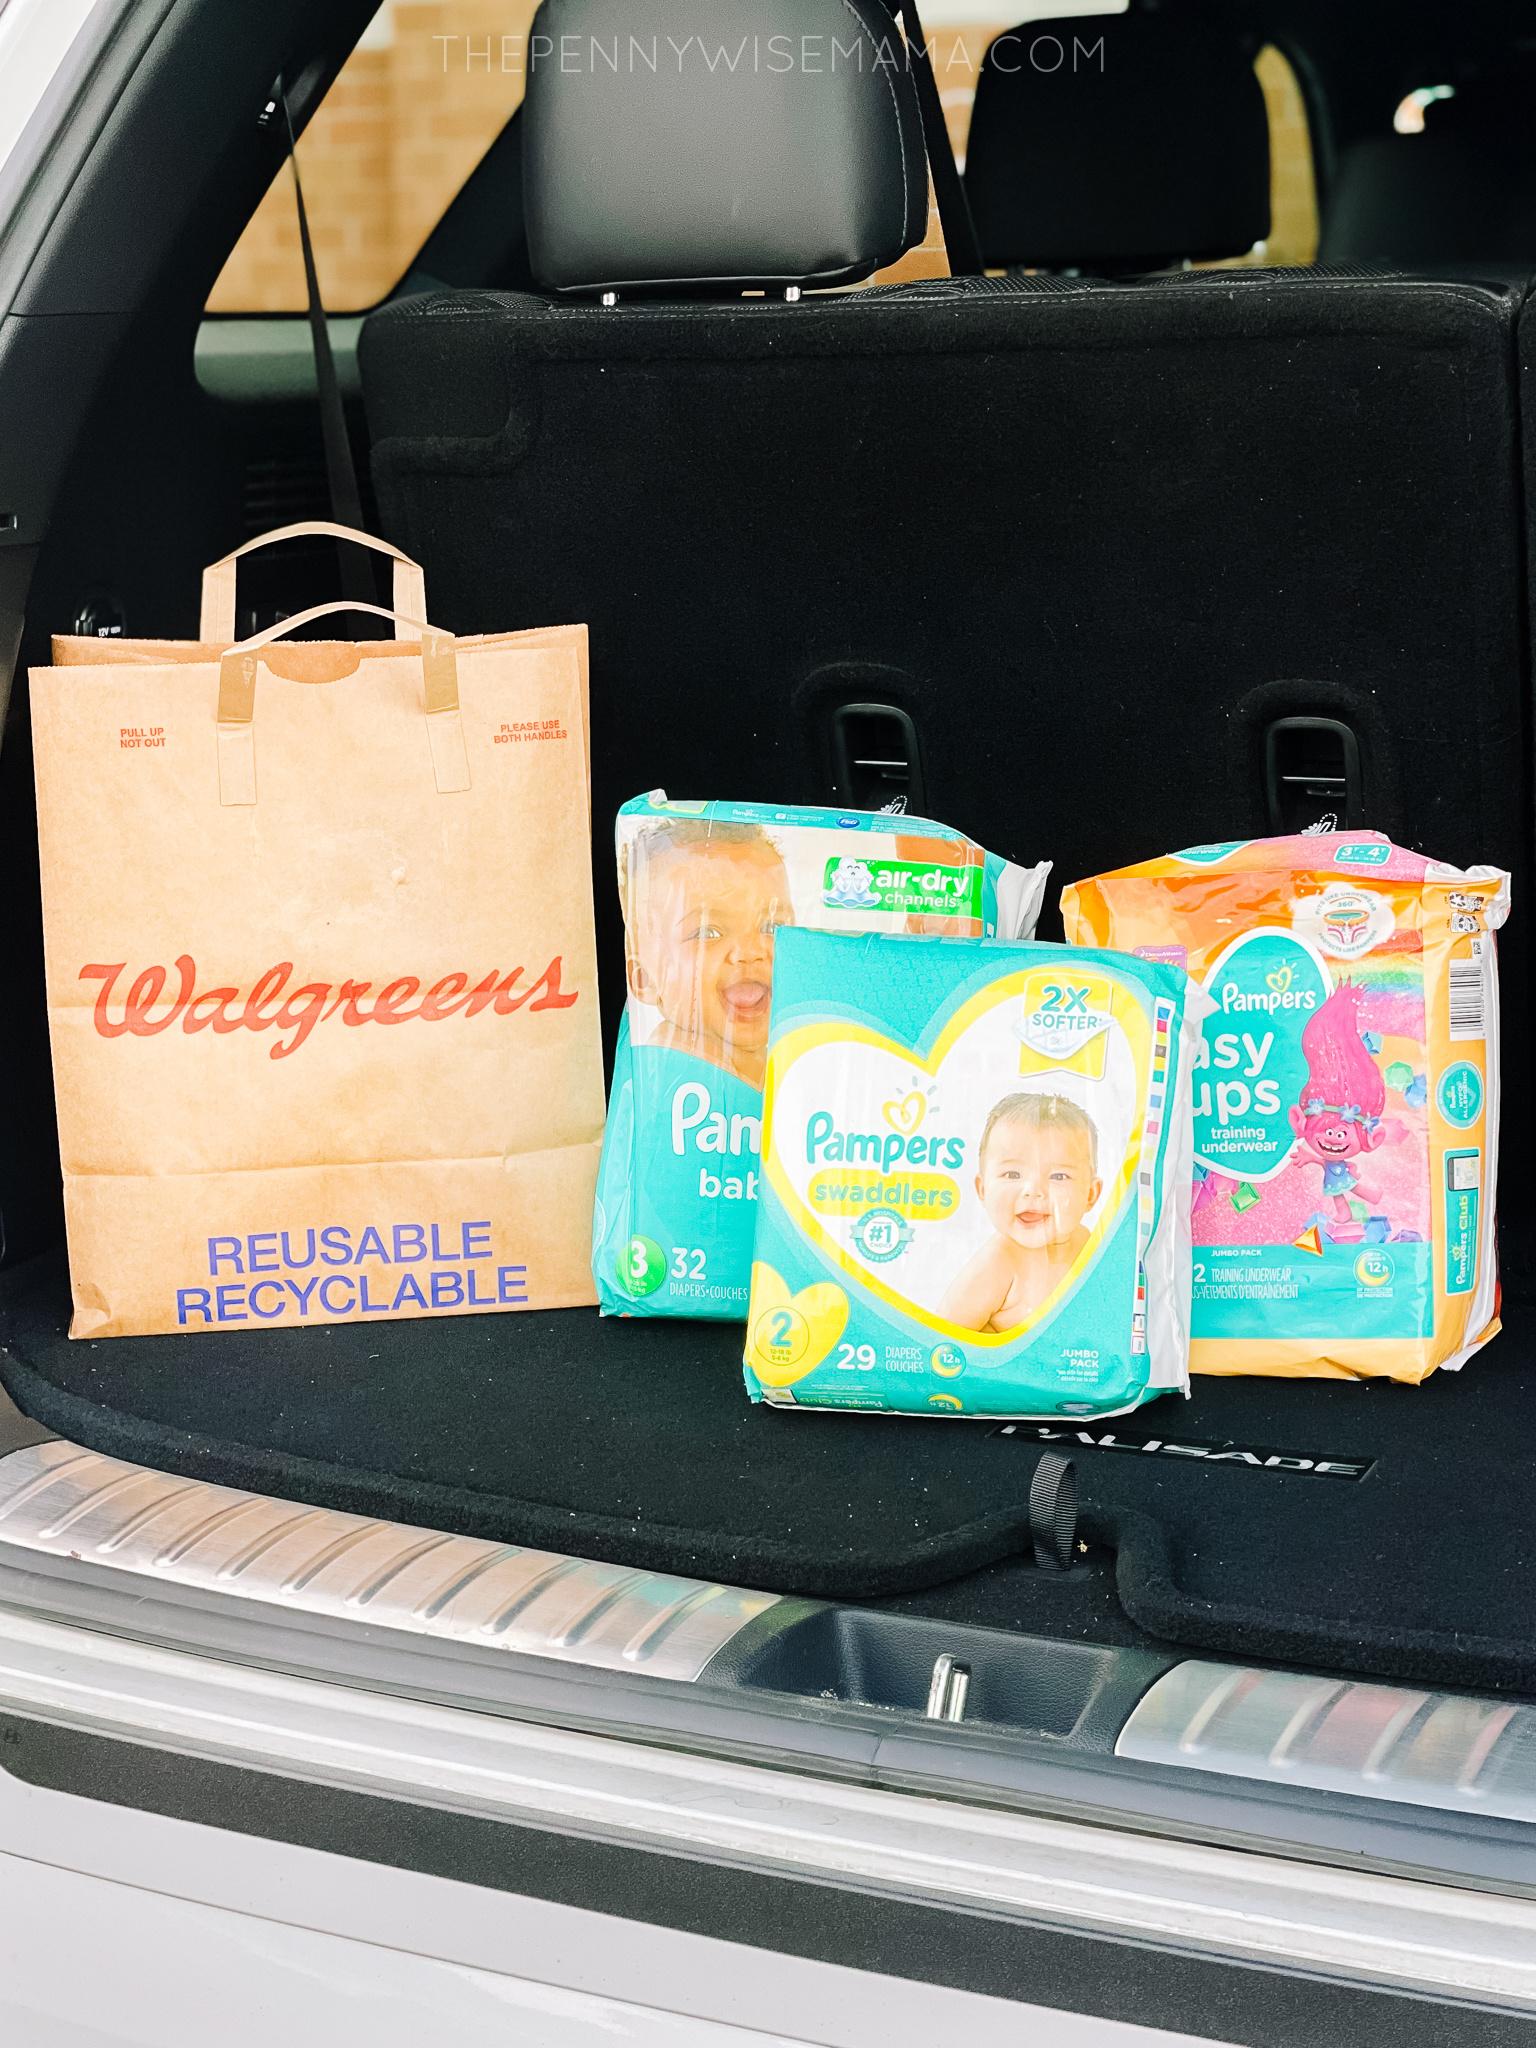 Save Big on Pampers at Walgreens this Week!